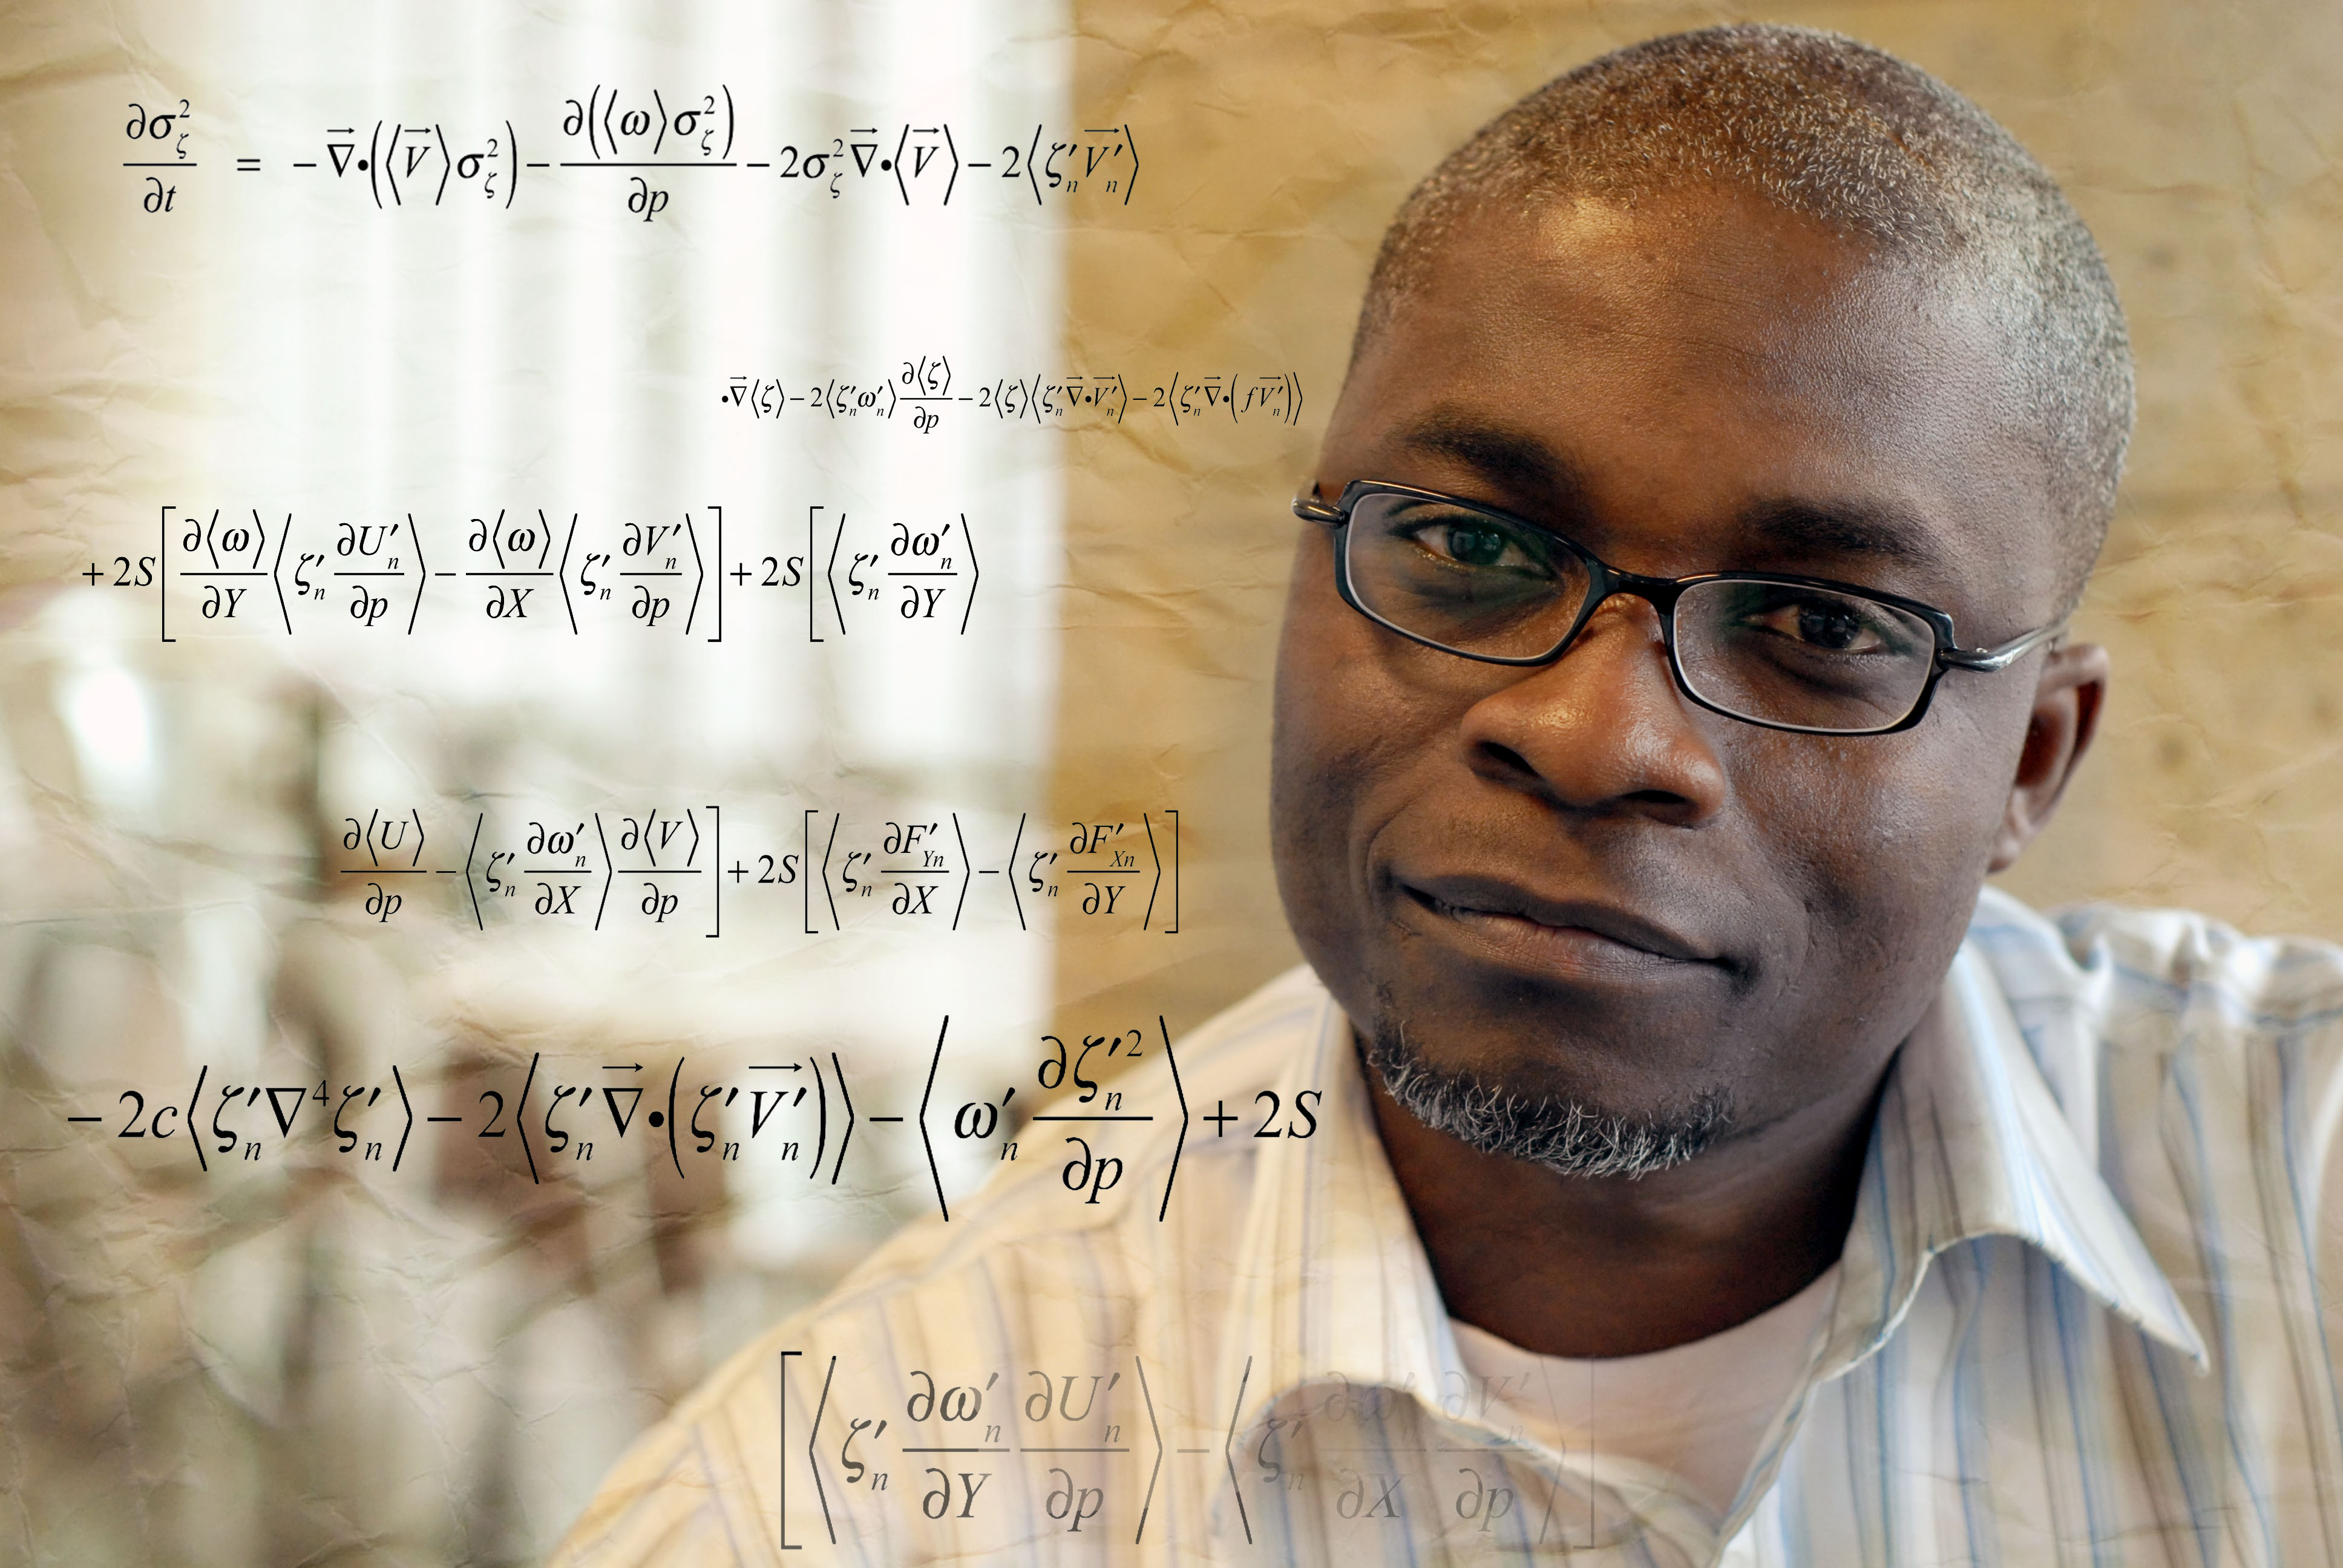 Oumarou Nikiema